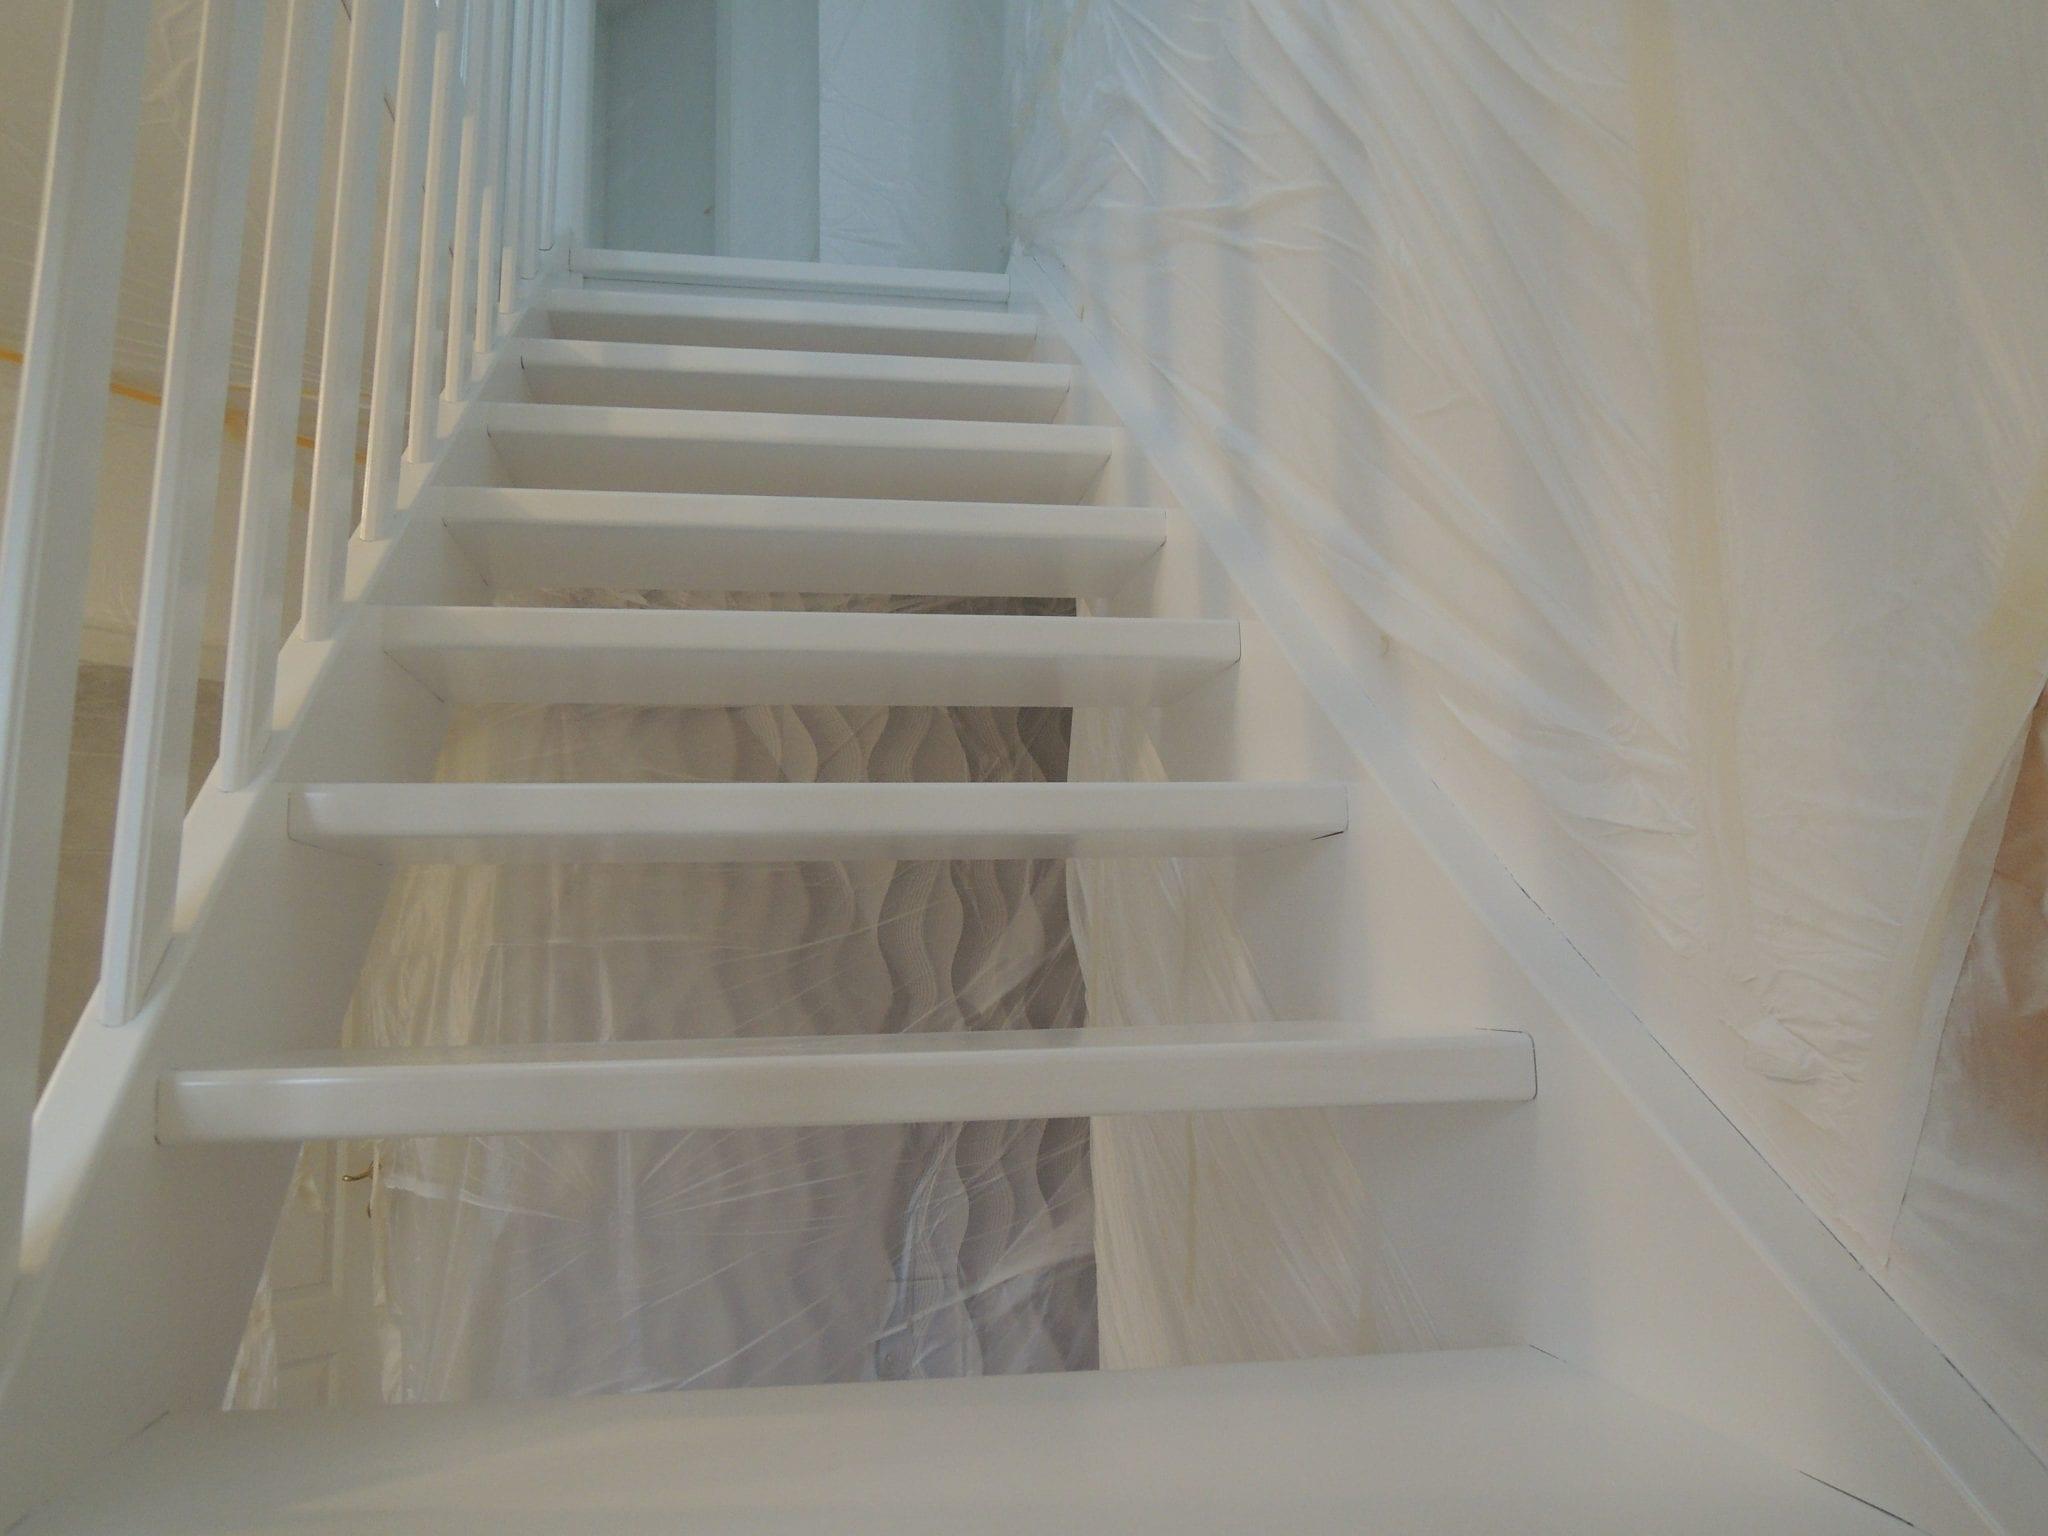 treppe lackieren great stalen trap en balustrade treppe lackieren wohnzimmer neue huser with. Black Bedroom Furniture Sets. Home Design Ideas